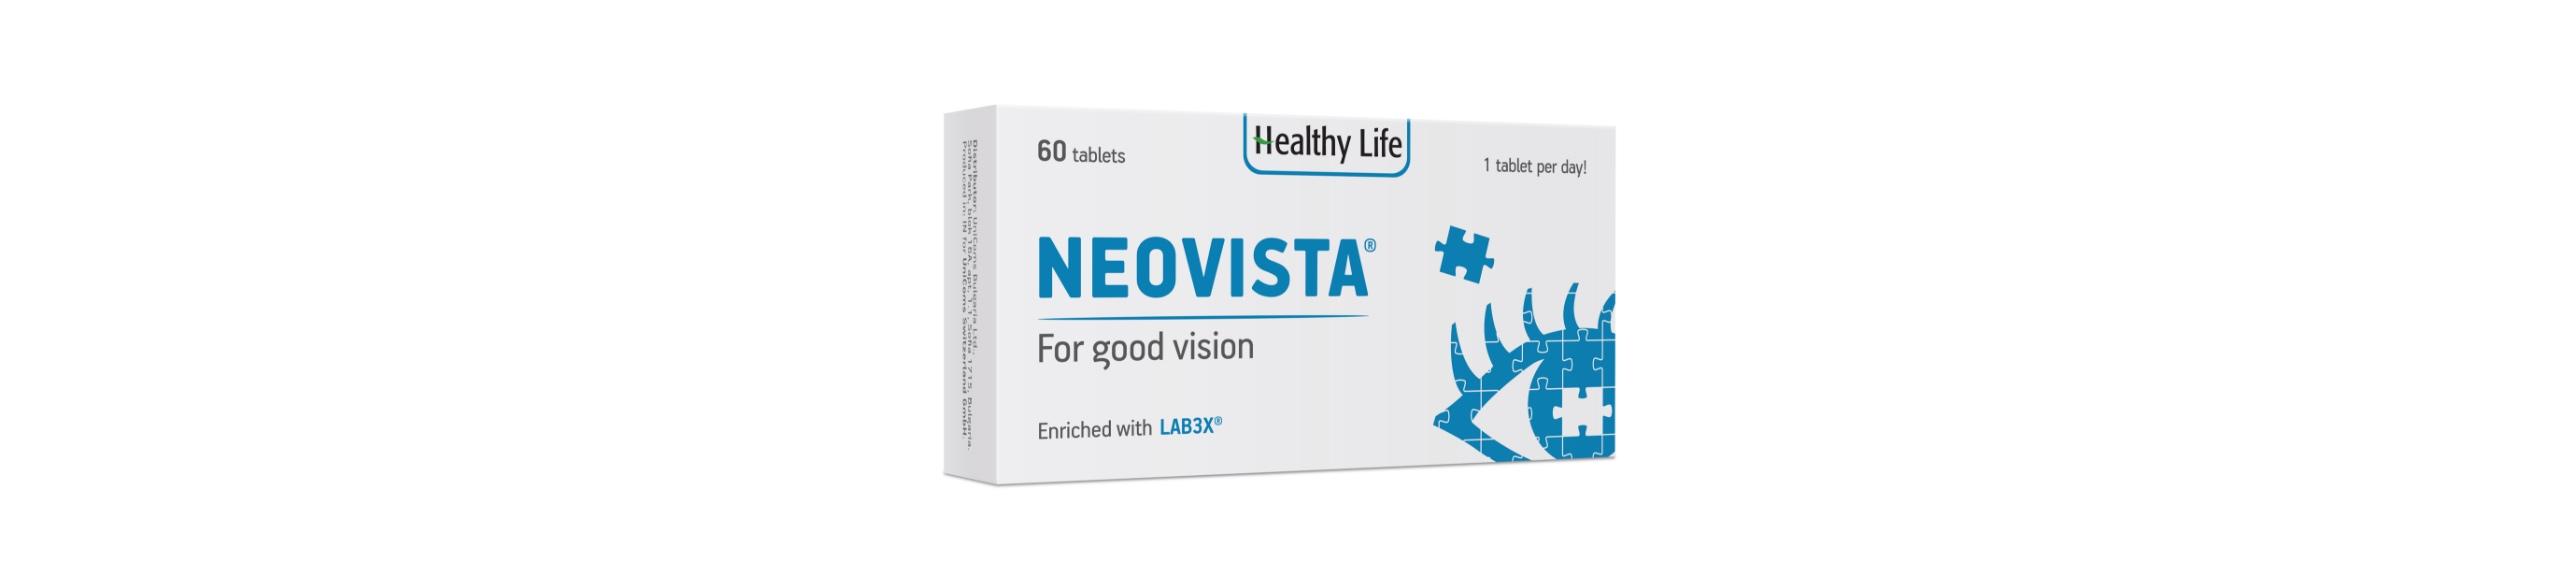 P3-Slider-img-Neovista2